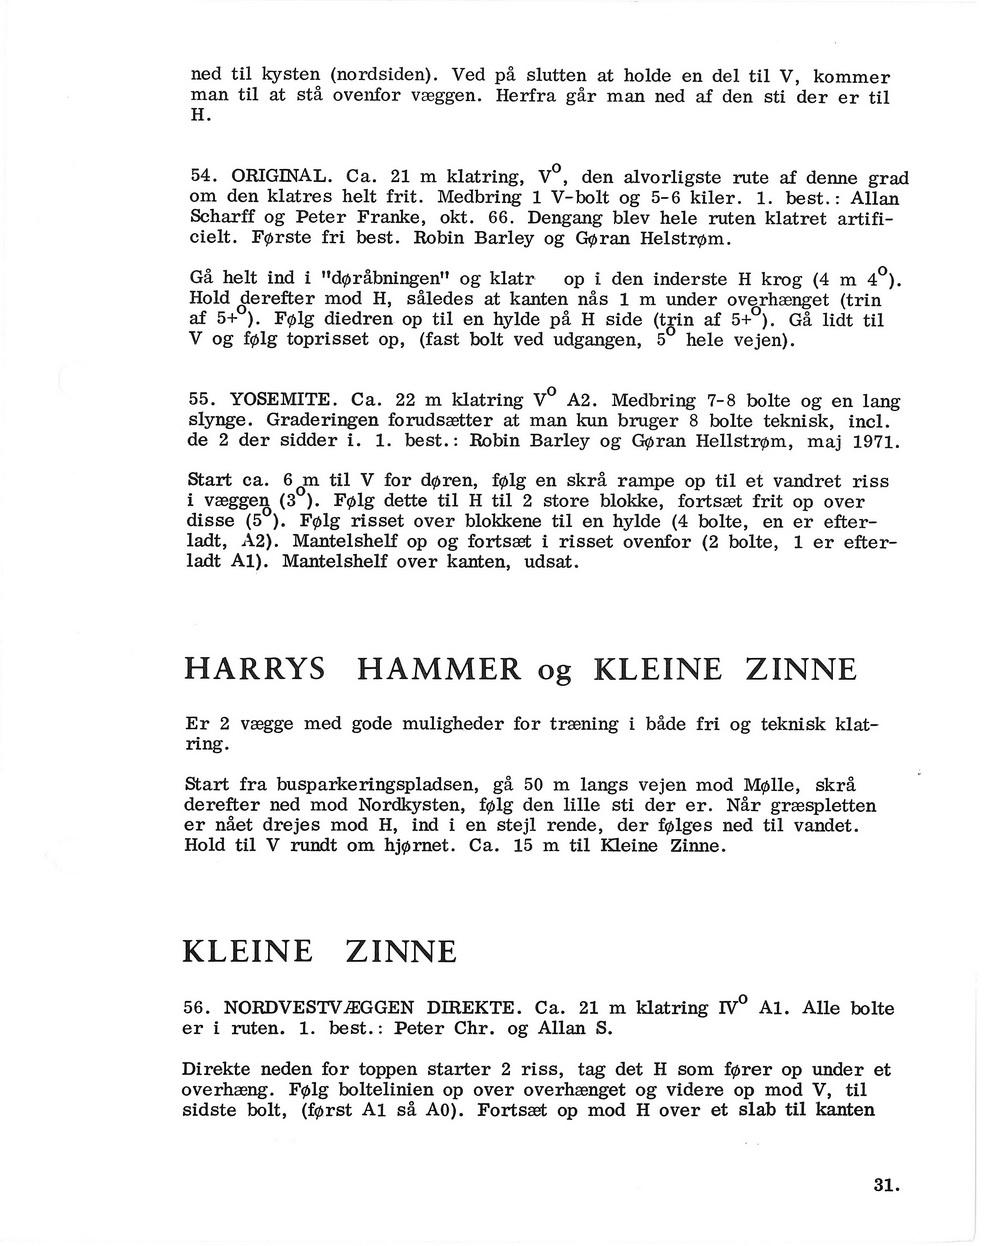 Kullen guide 1972 031.jpg